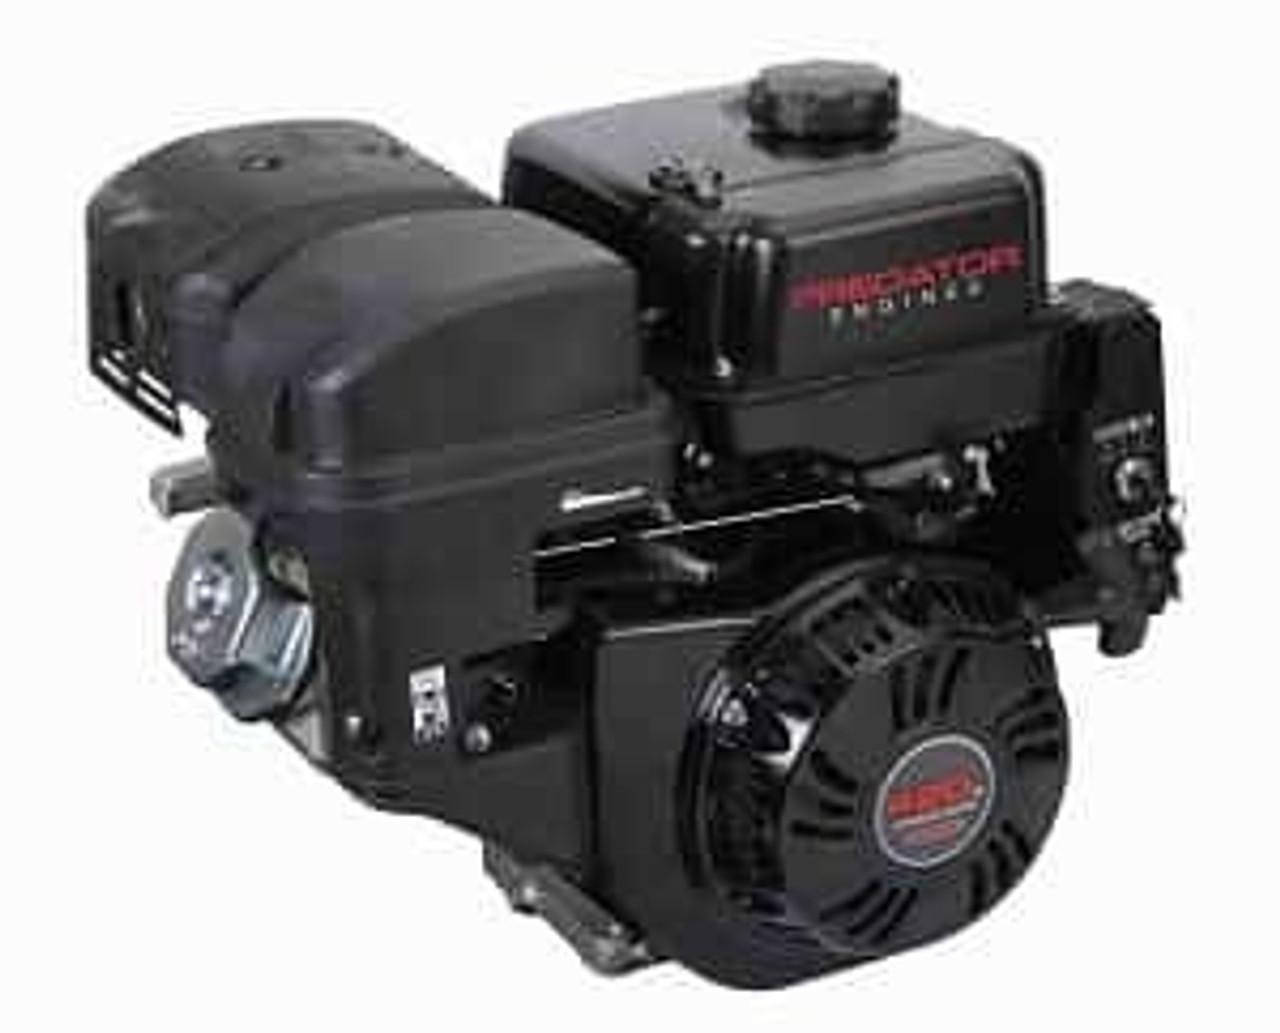 Predator 420cc 13HP Engine - Performance Mods and